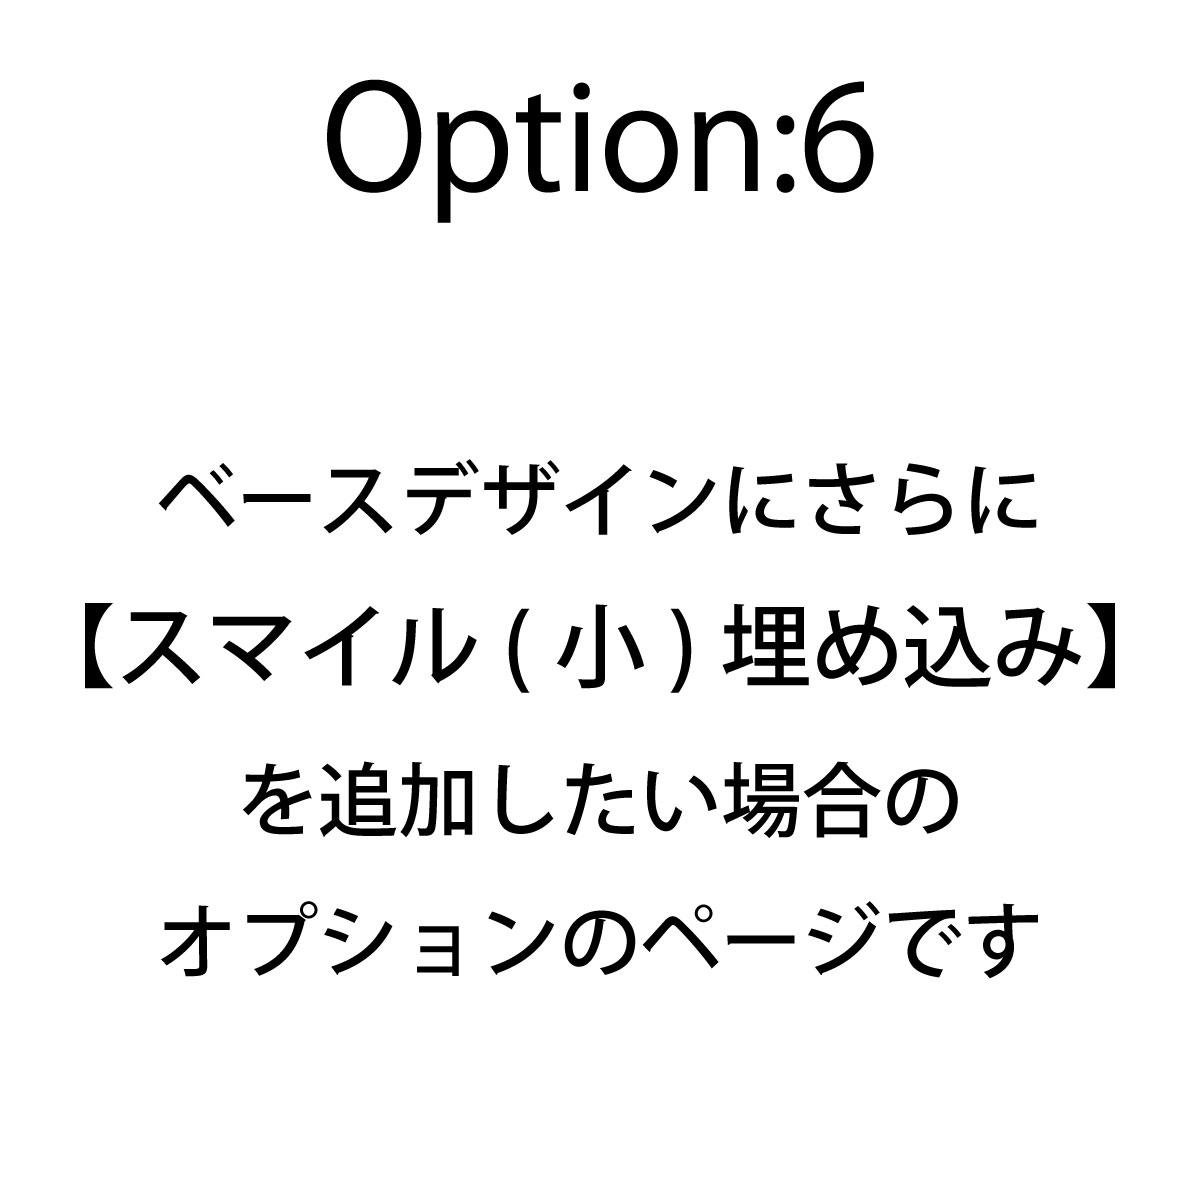 iPhoneOpenCase:    Option6:スマイル(小)埋込追加